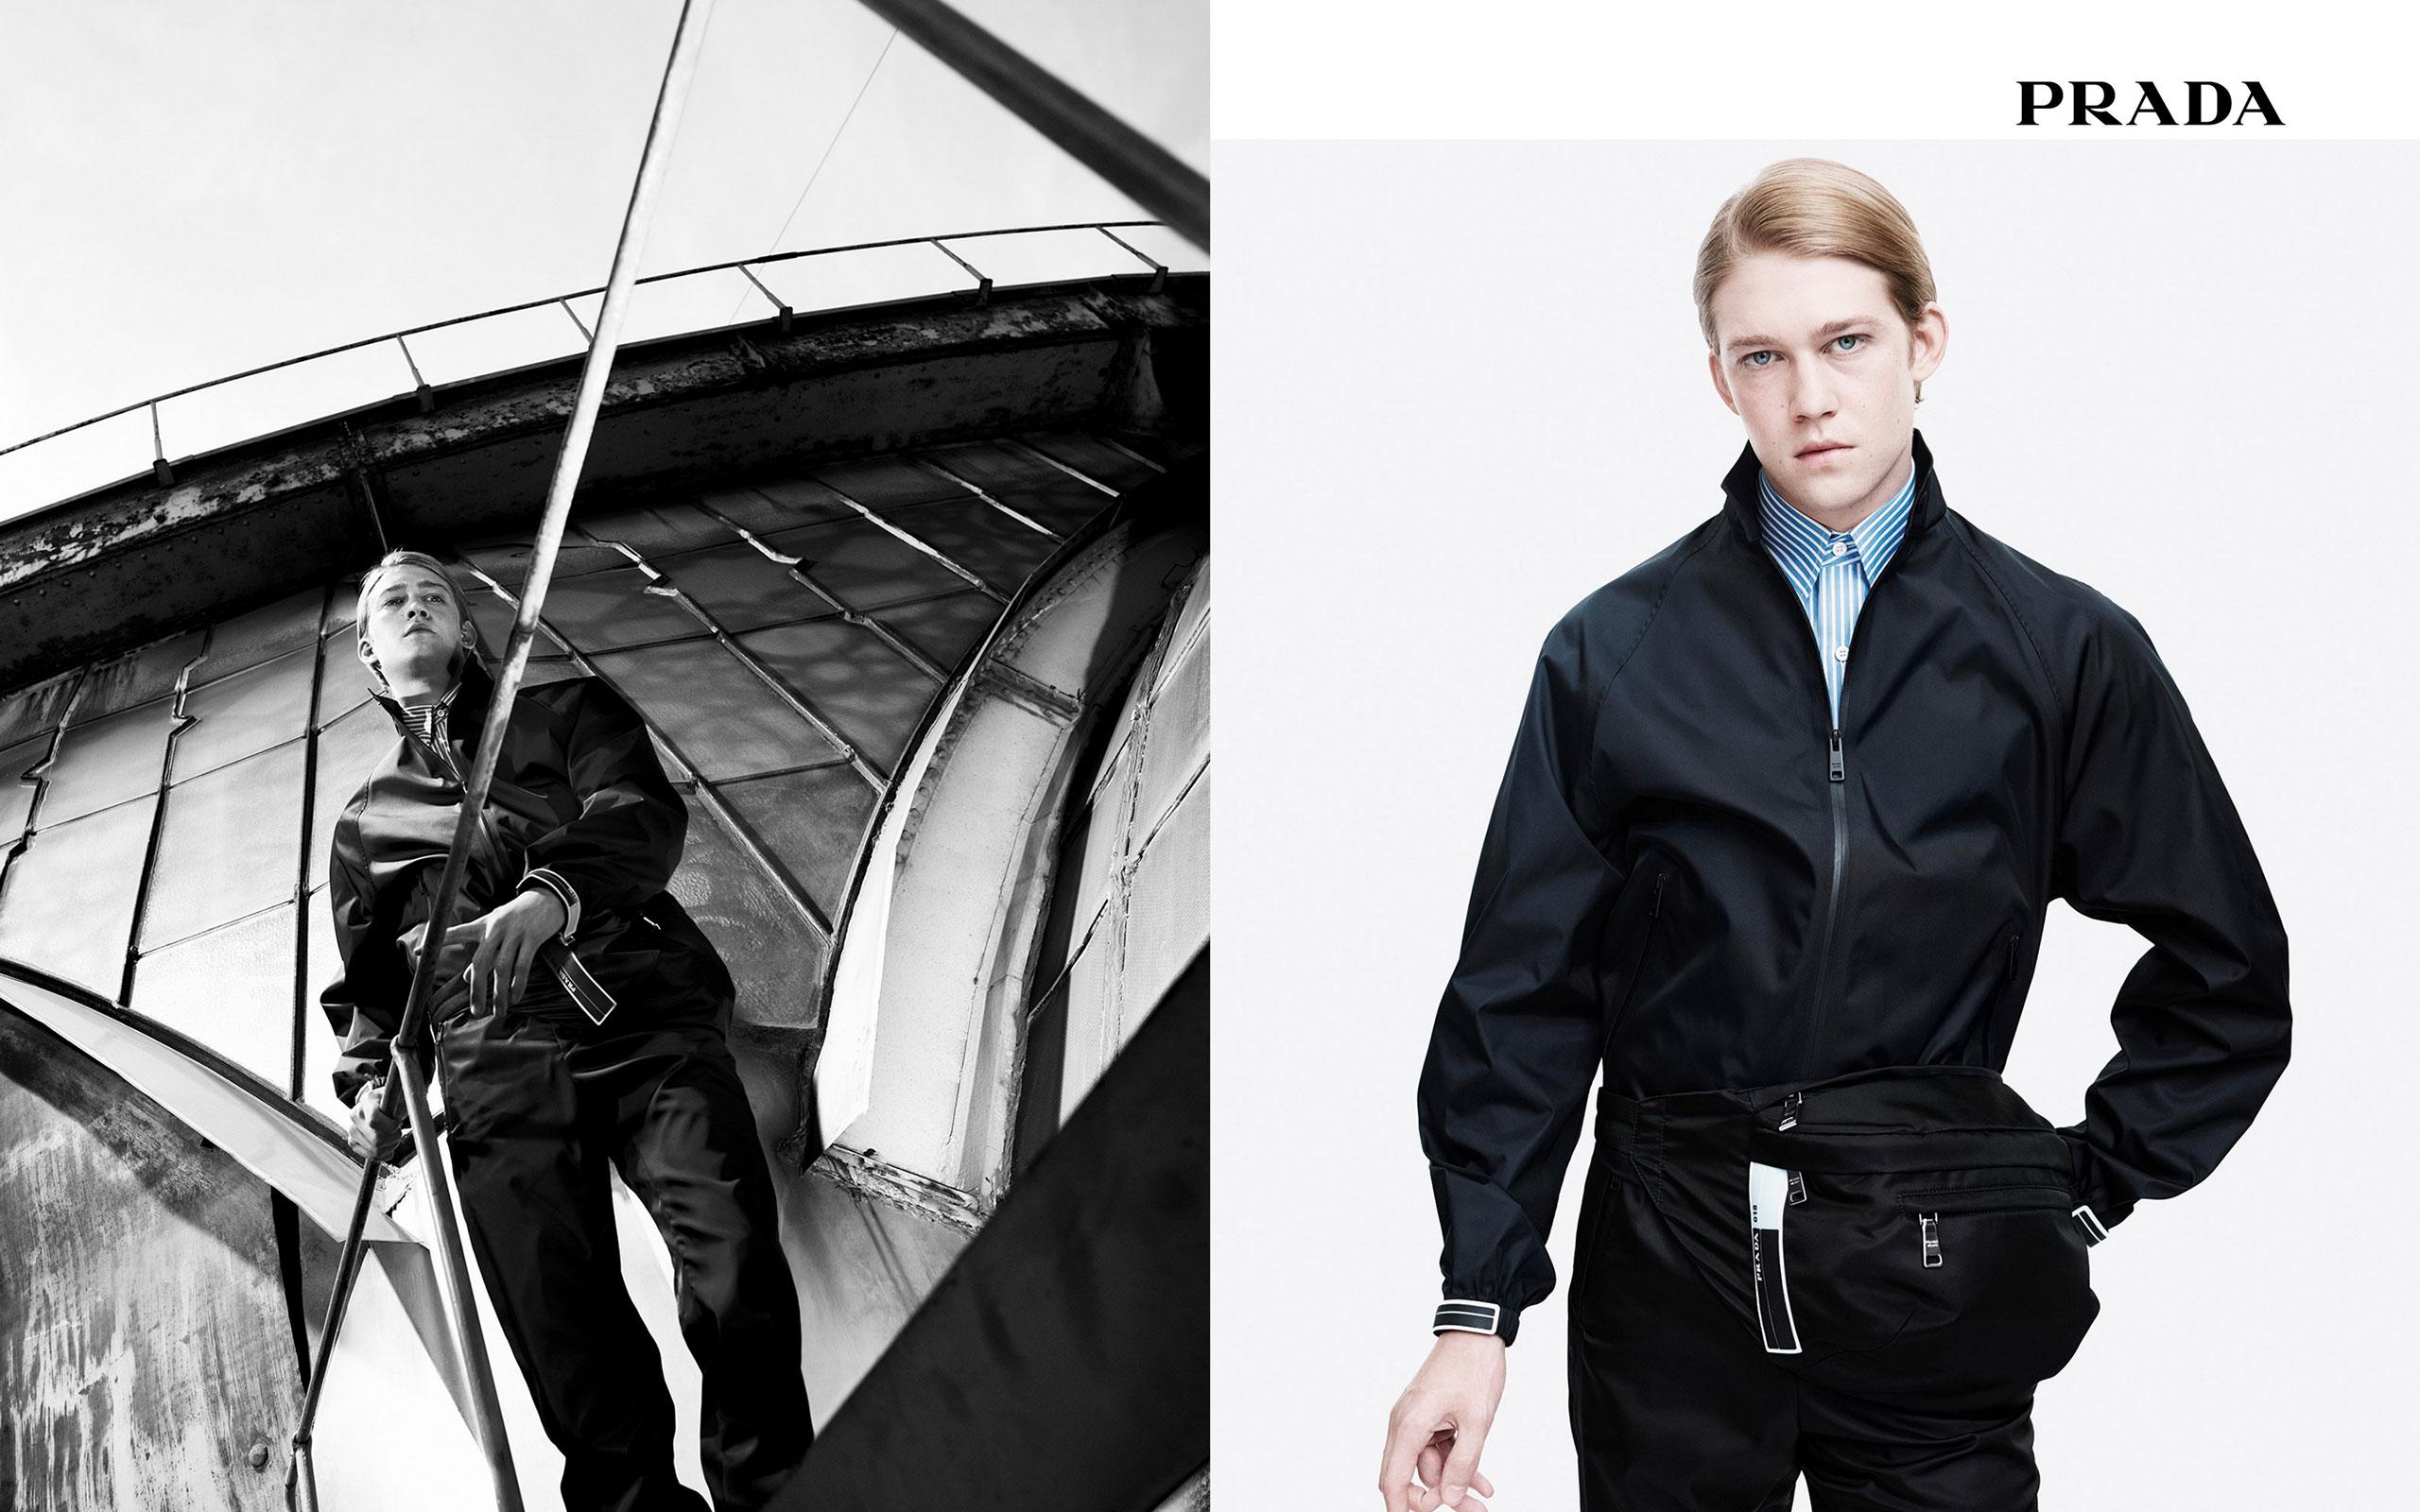 Prada Men's 2018 Advertising Campaign 'Ascension'